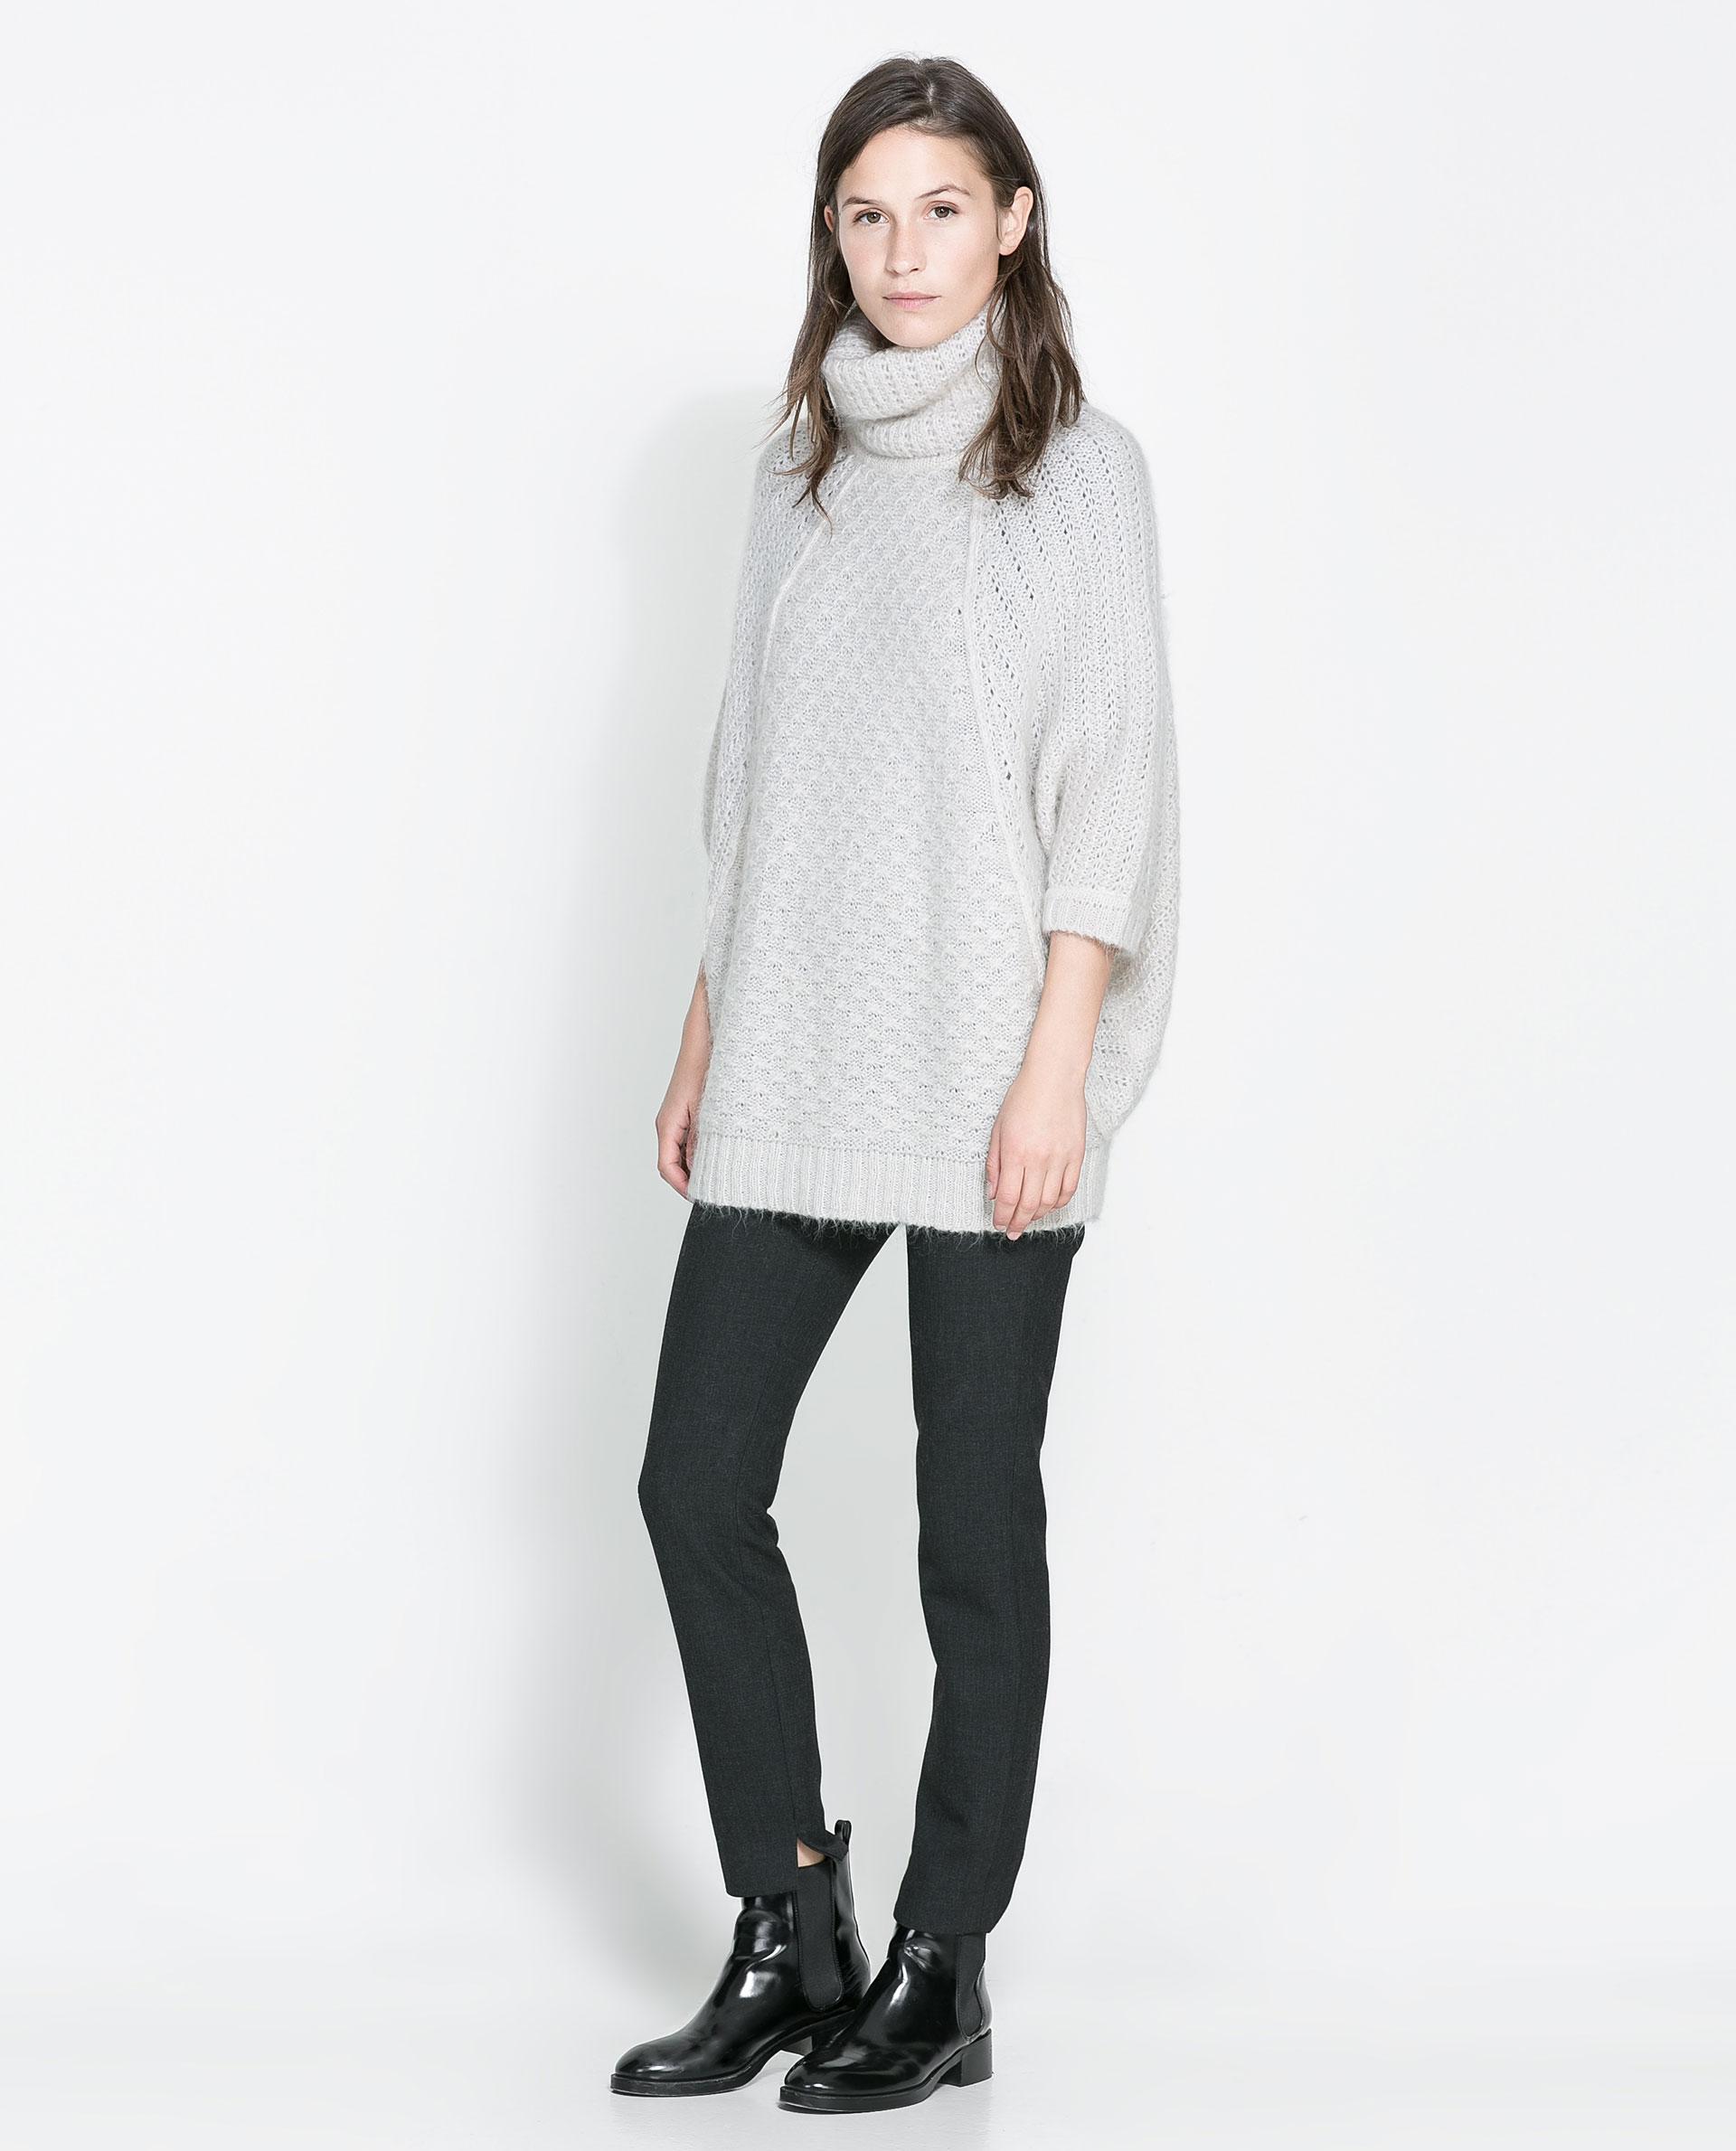 Zara Cardigan Sweater 18